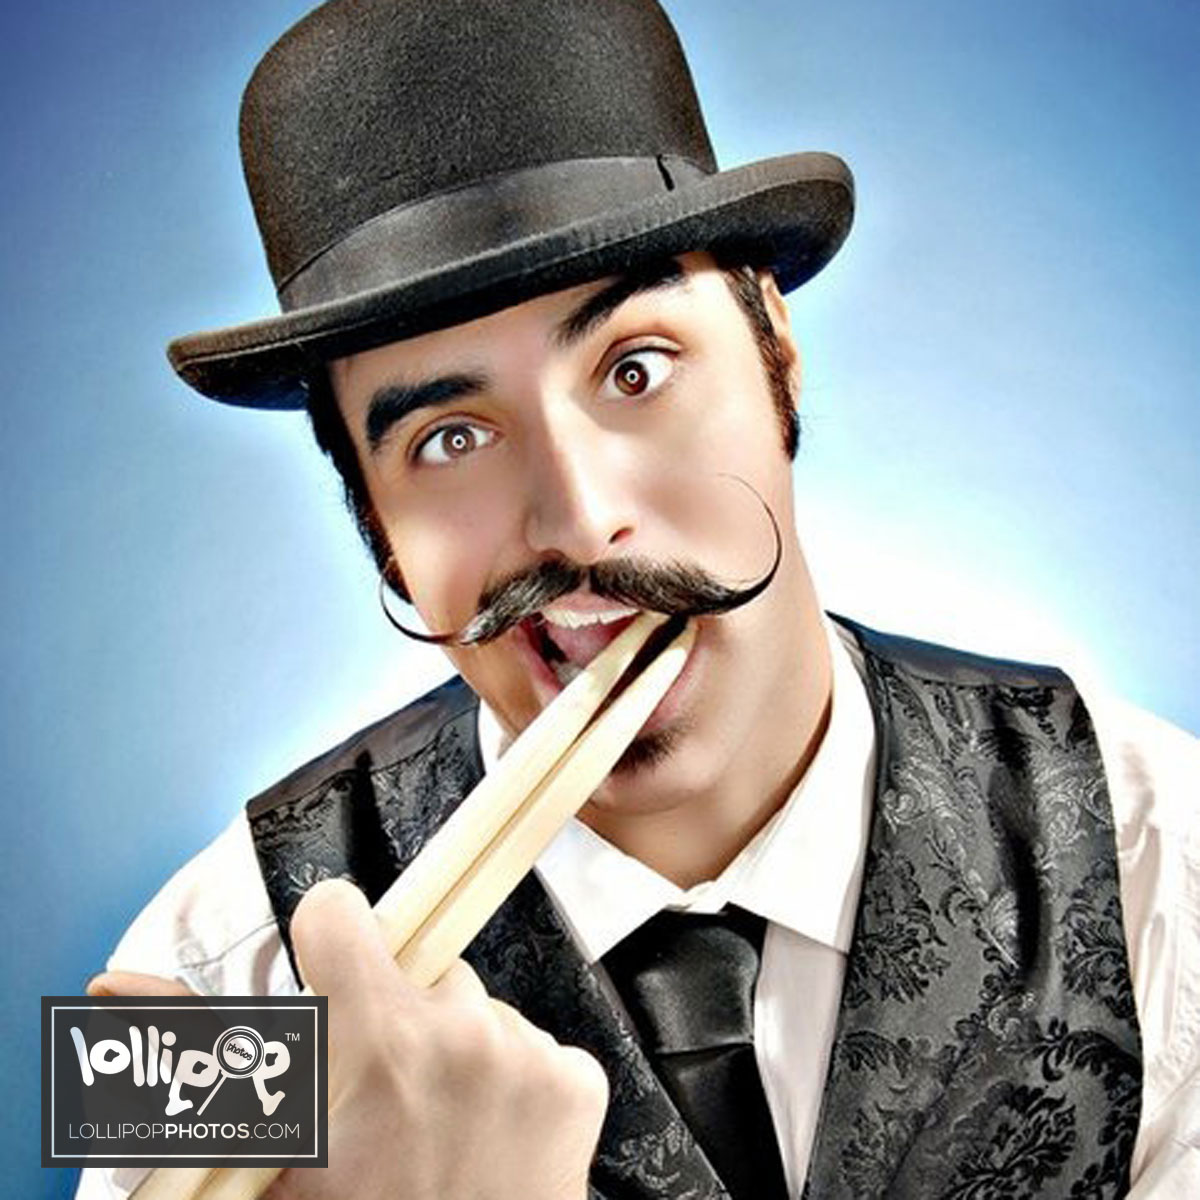 msdig-nora-canfield-lollipop-photos-607.jpg